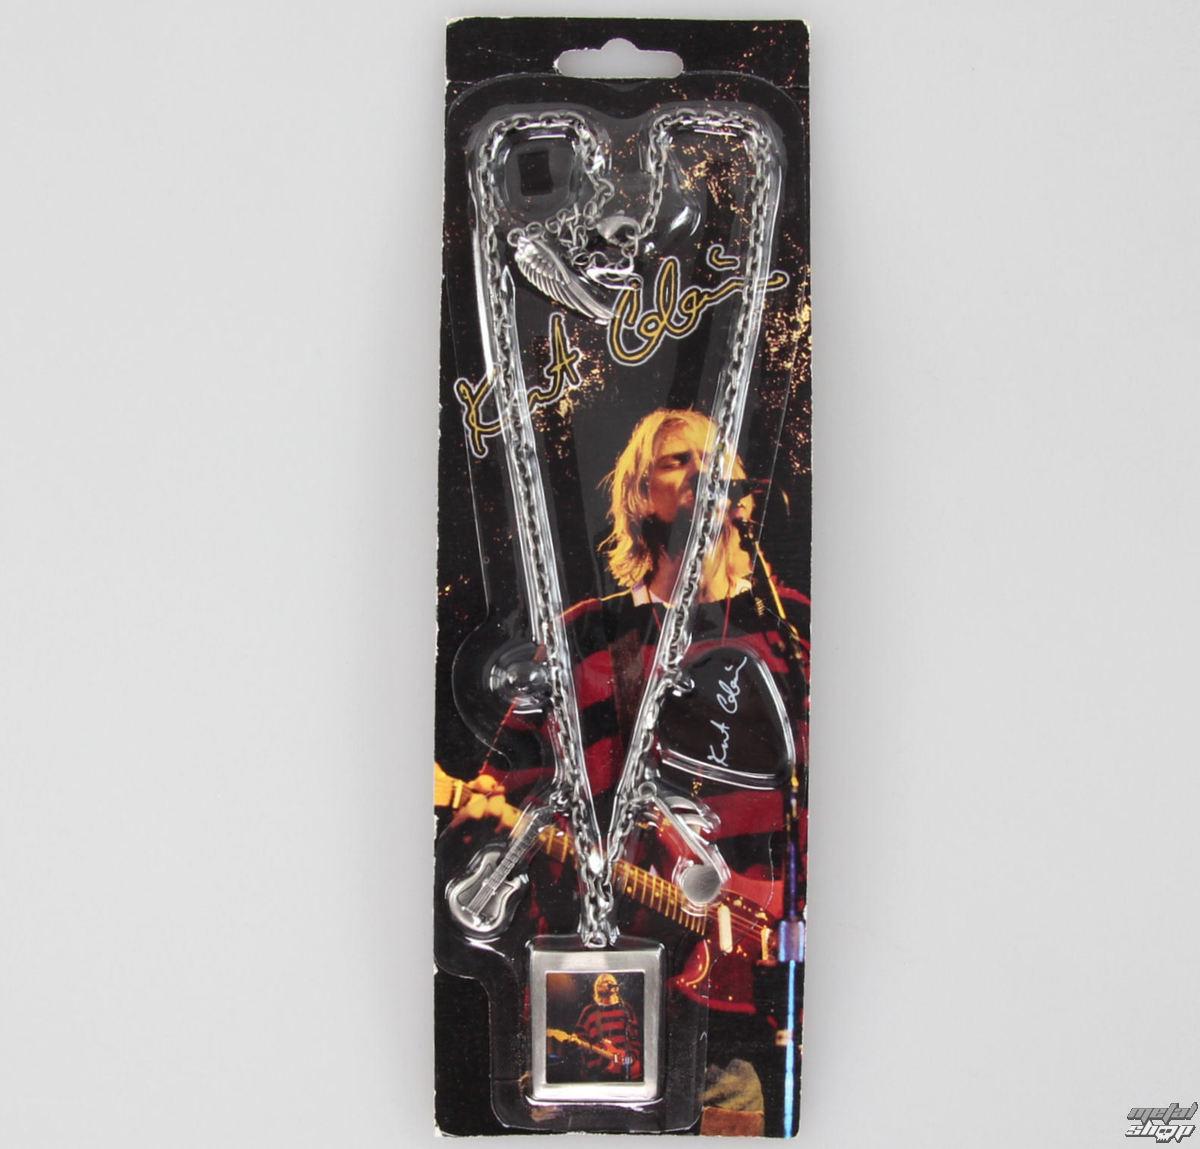 obojek Kurt Cobain - LIVE NATION - PE43249ACCP